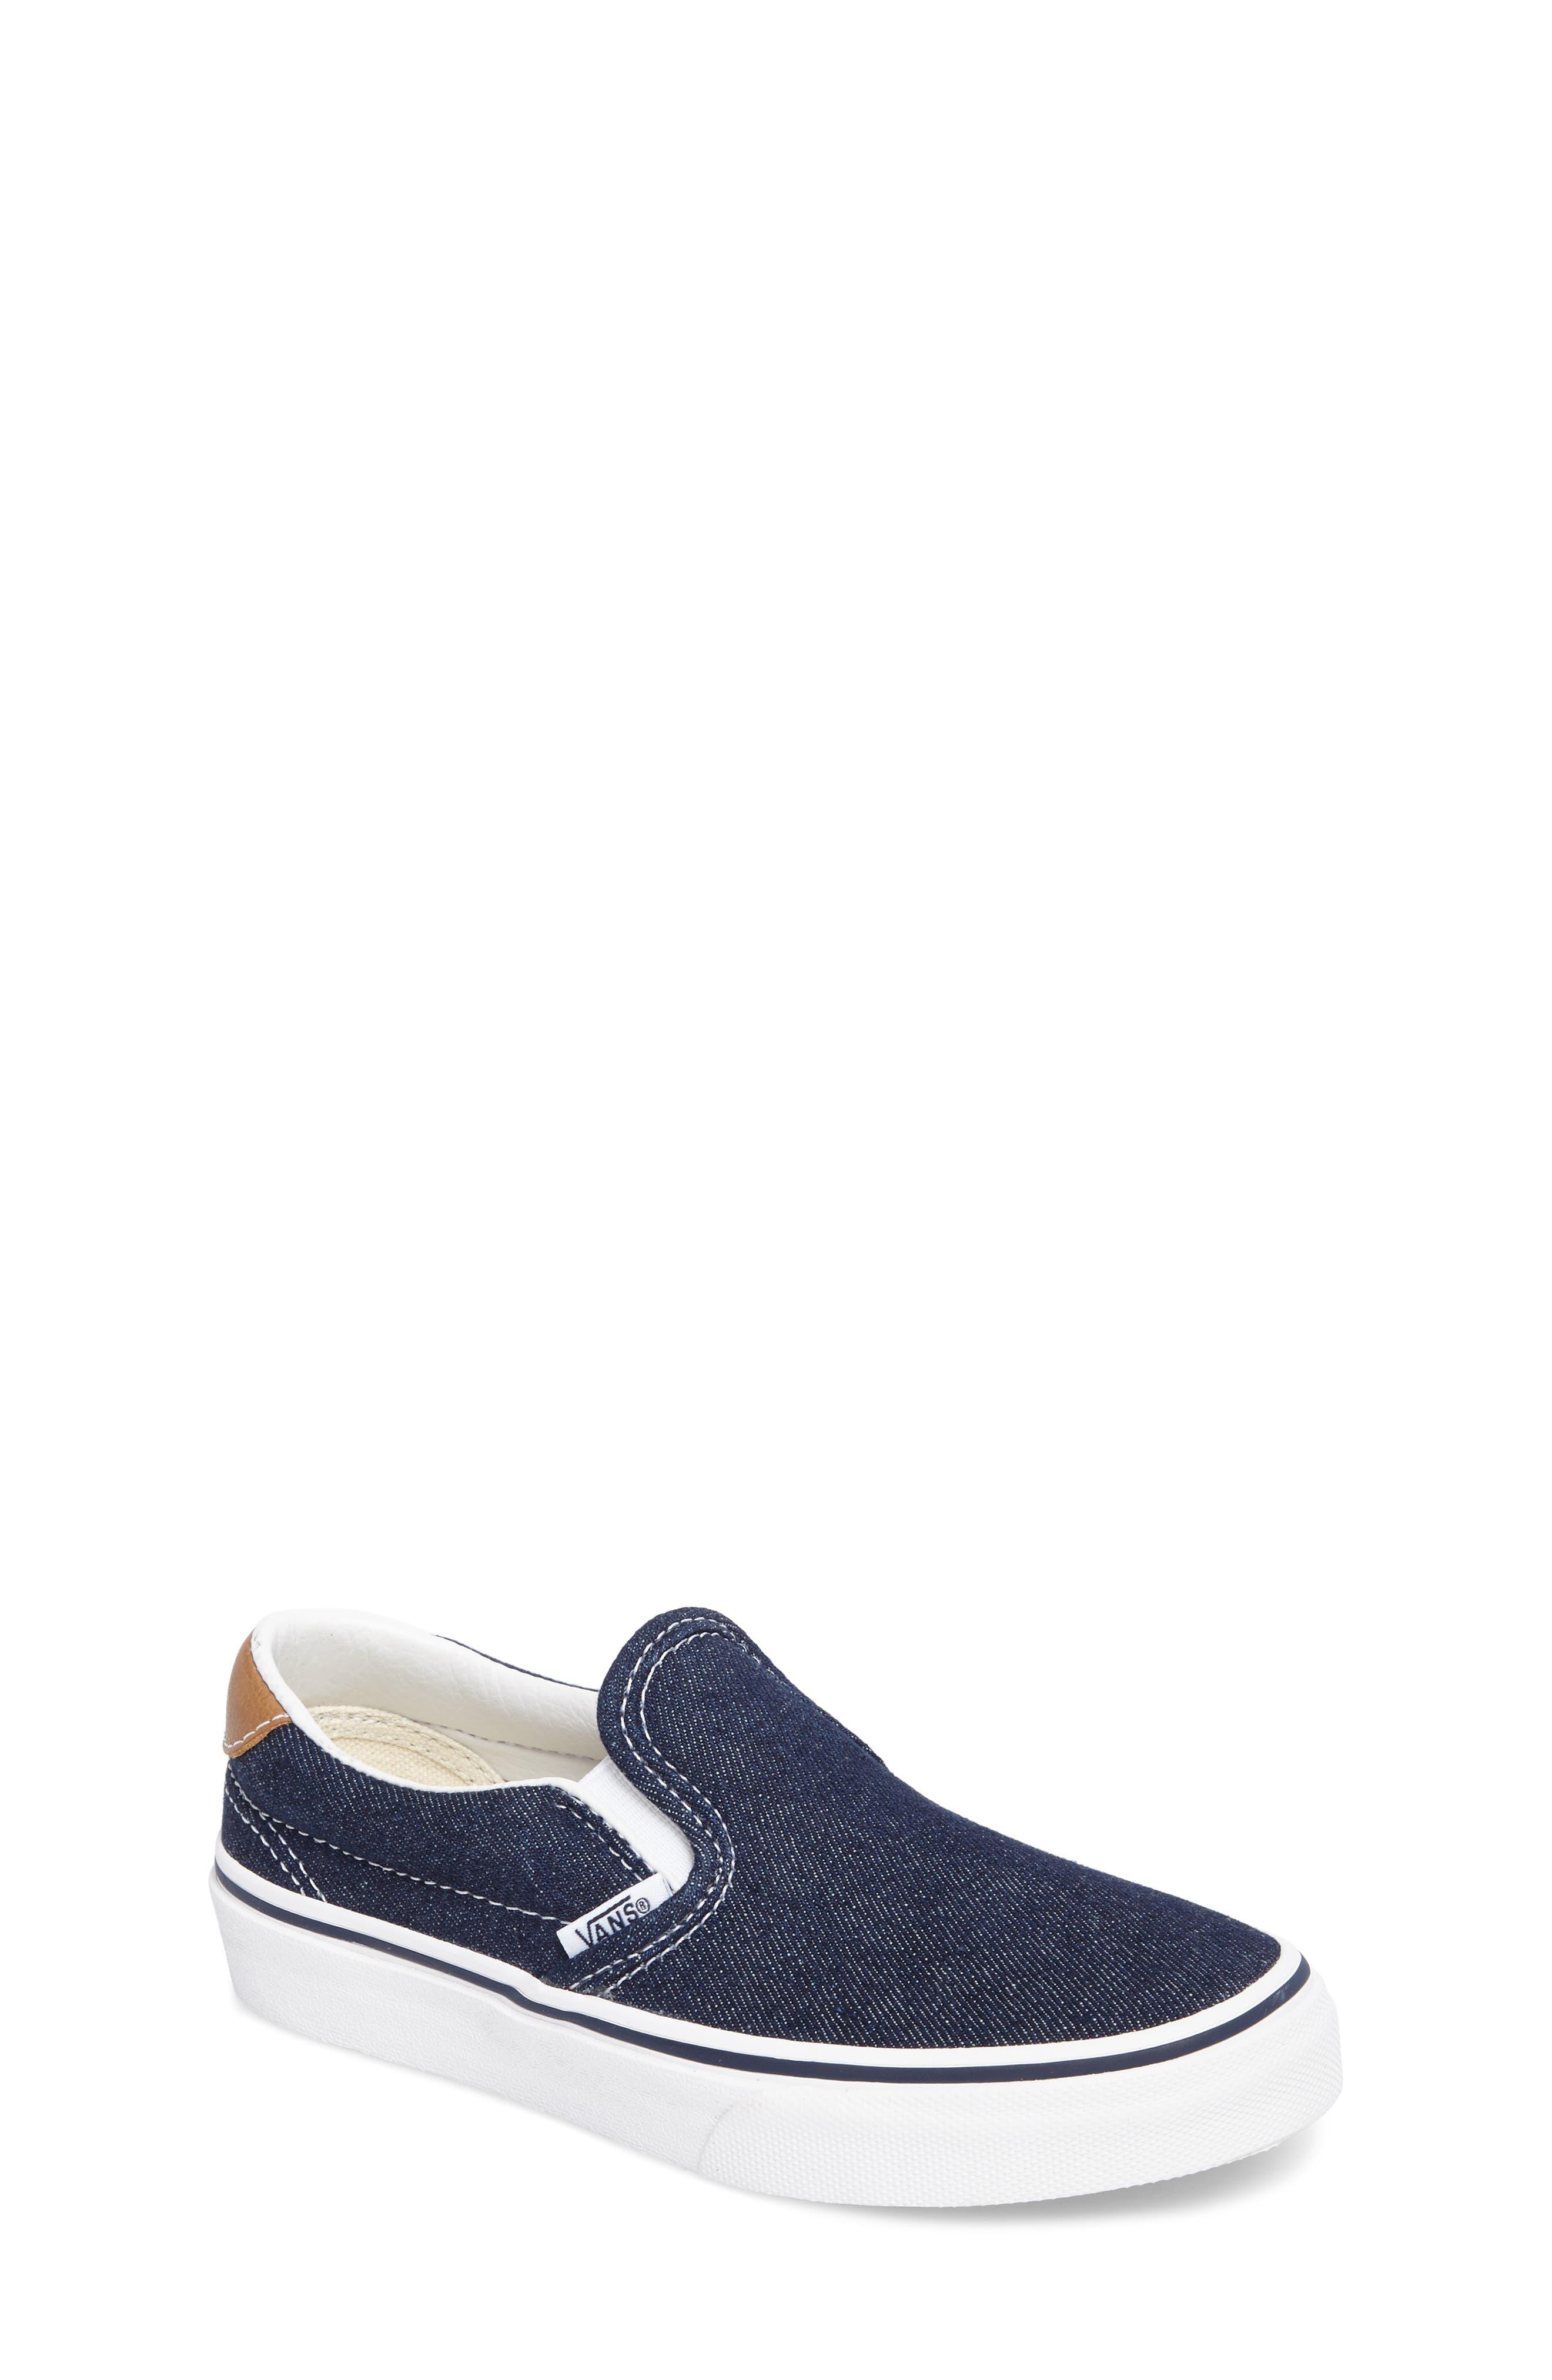 Denim C&L Slip-On 59 Sneaker,                             Main thumbnail 1, color,                             Denim Dress Blues/ Chipmunk